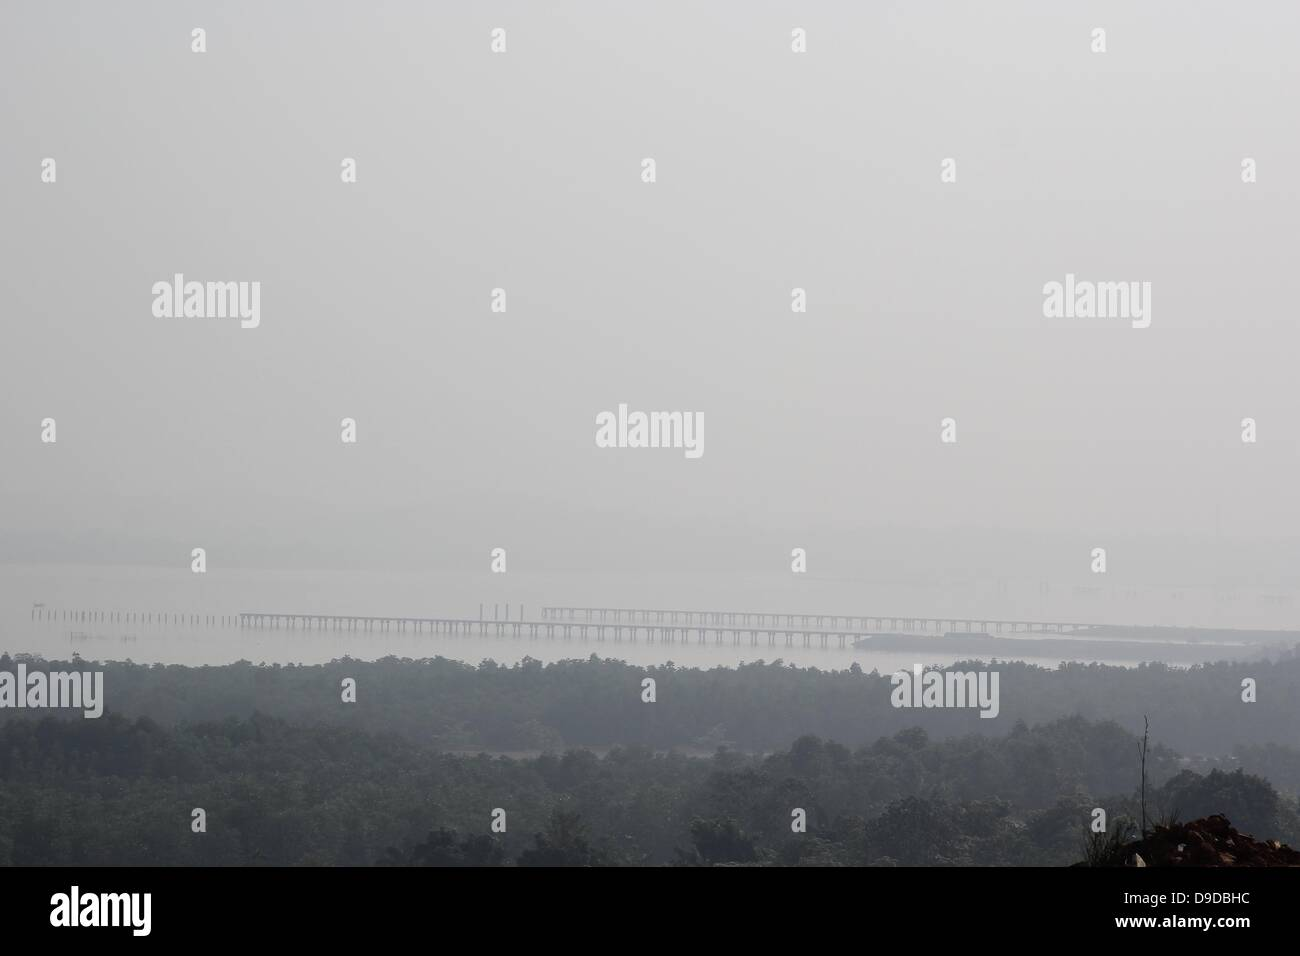 Bintan Island, Indonesia. 18th June, 2013. JUNE 18, 2013:A view of haze air polution arrived in Bintan on June 18, - Stock Image